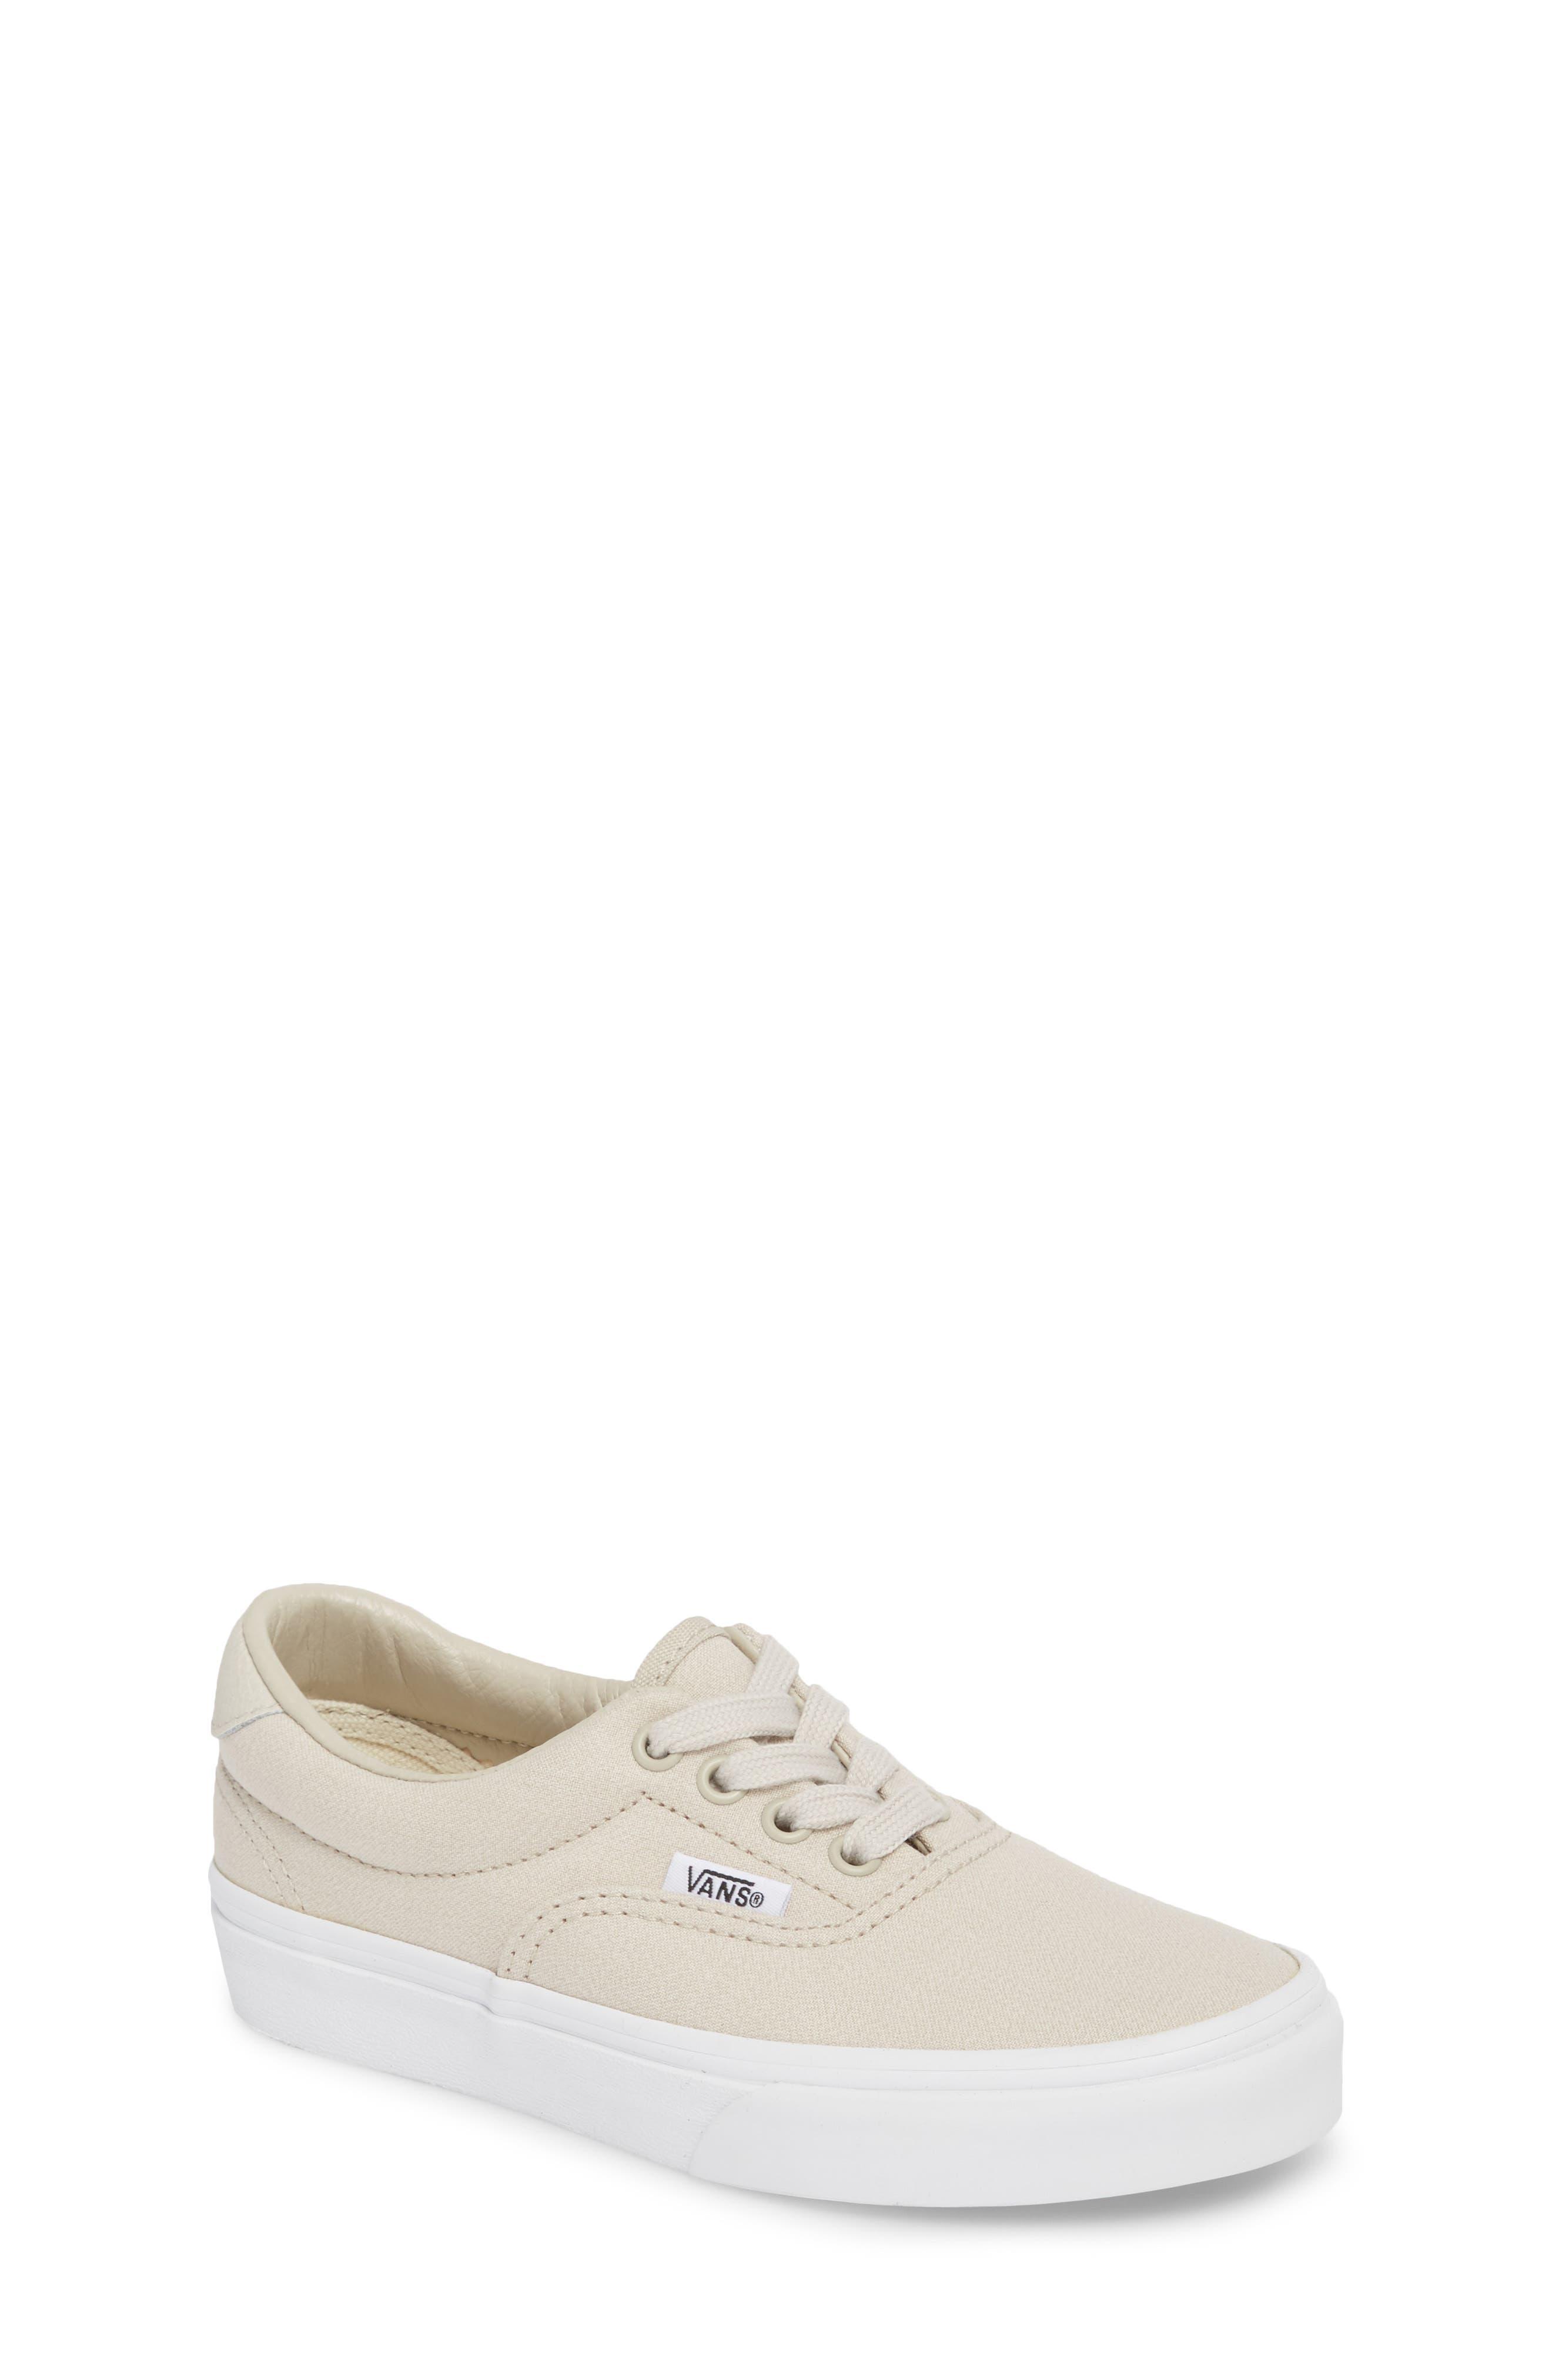 Vans Era 59 Bleacher Sneaker (Toddler, Little Kid & Big Kid)